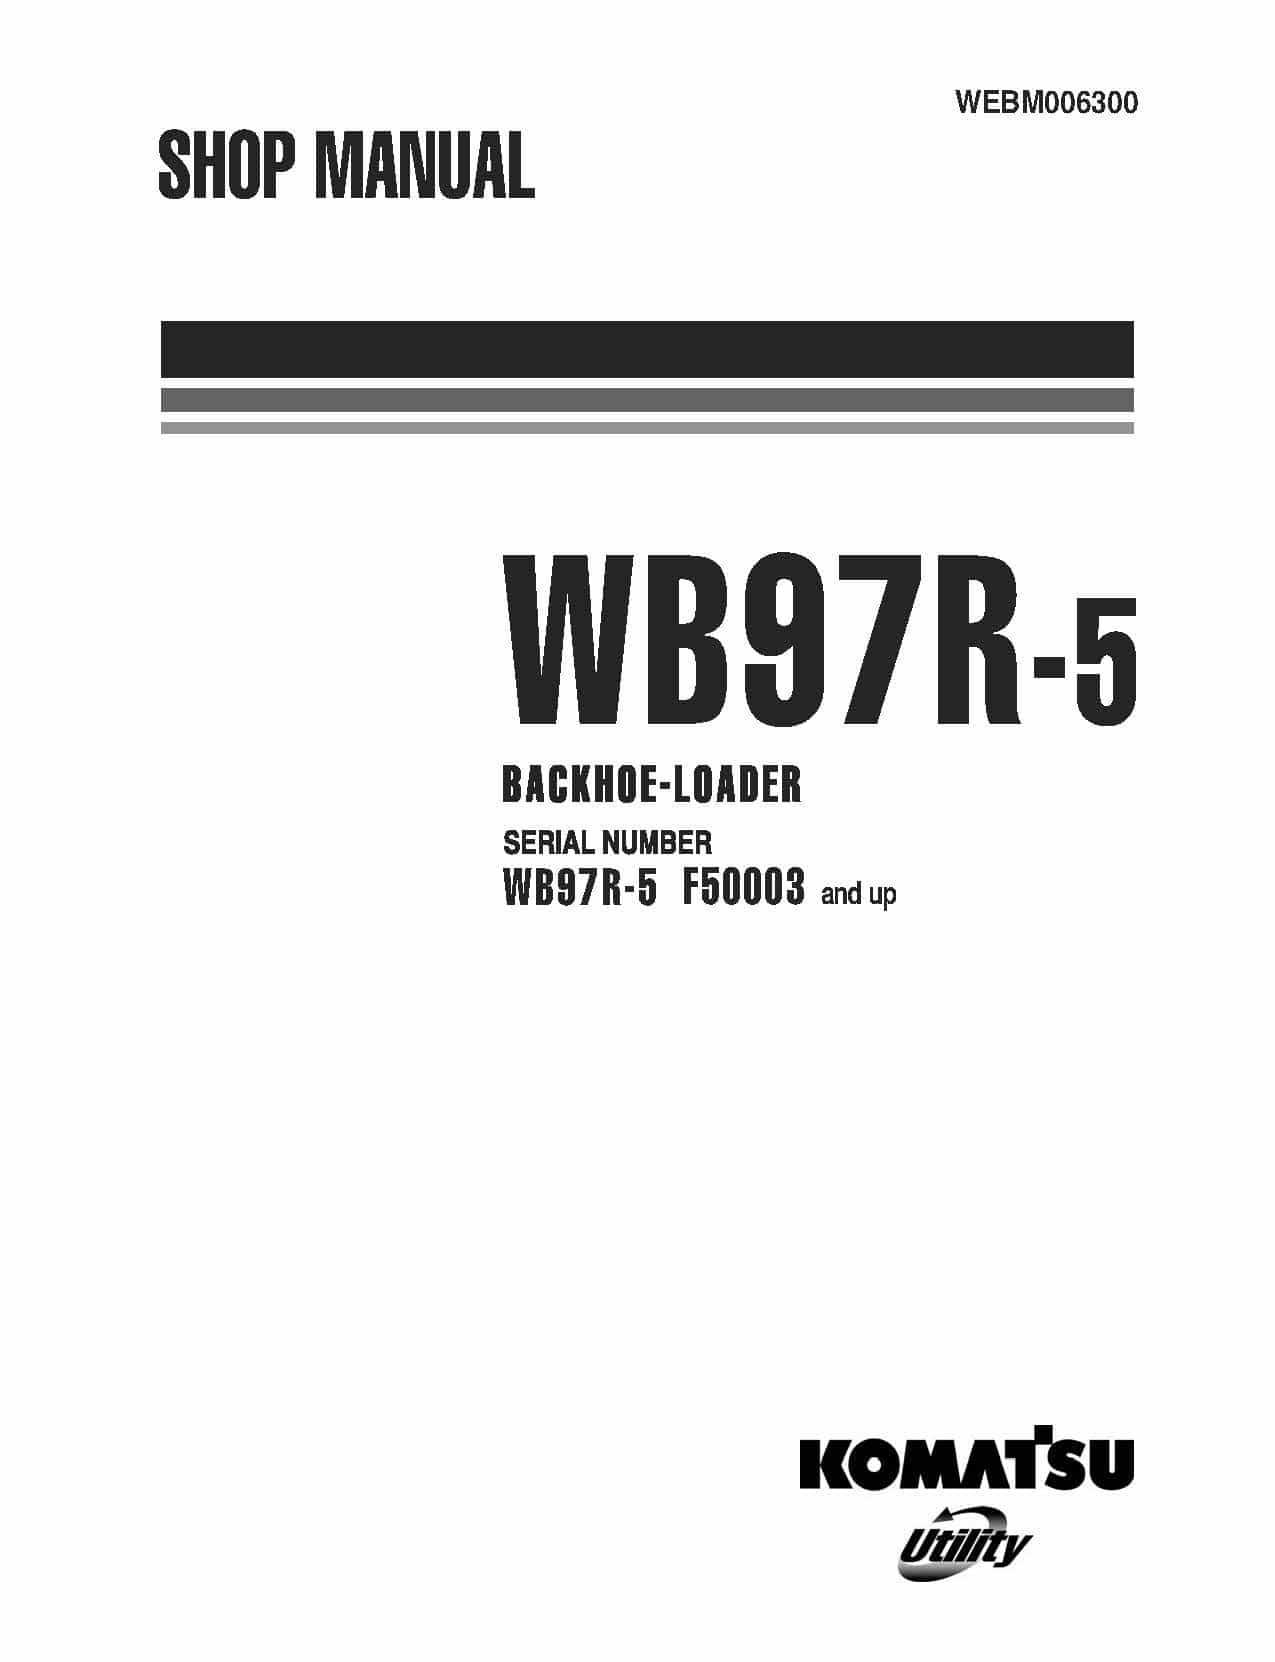 Komatsu WB97R-5 BACKHOE LOADER Workshop Repair Service